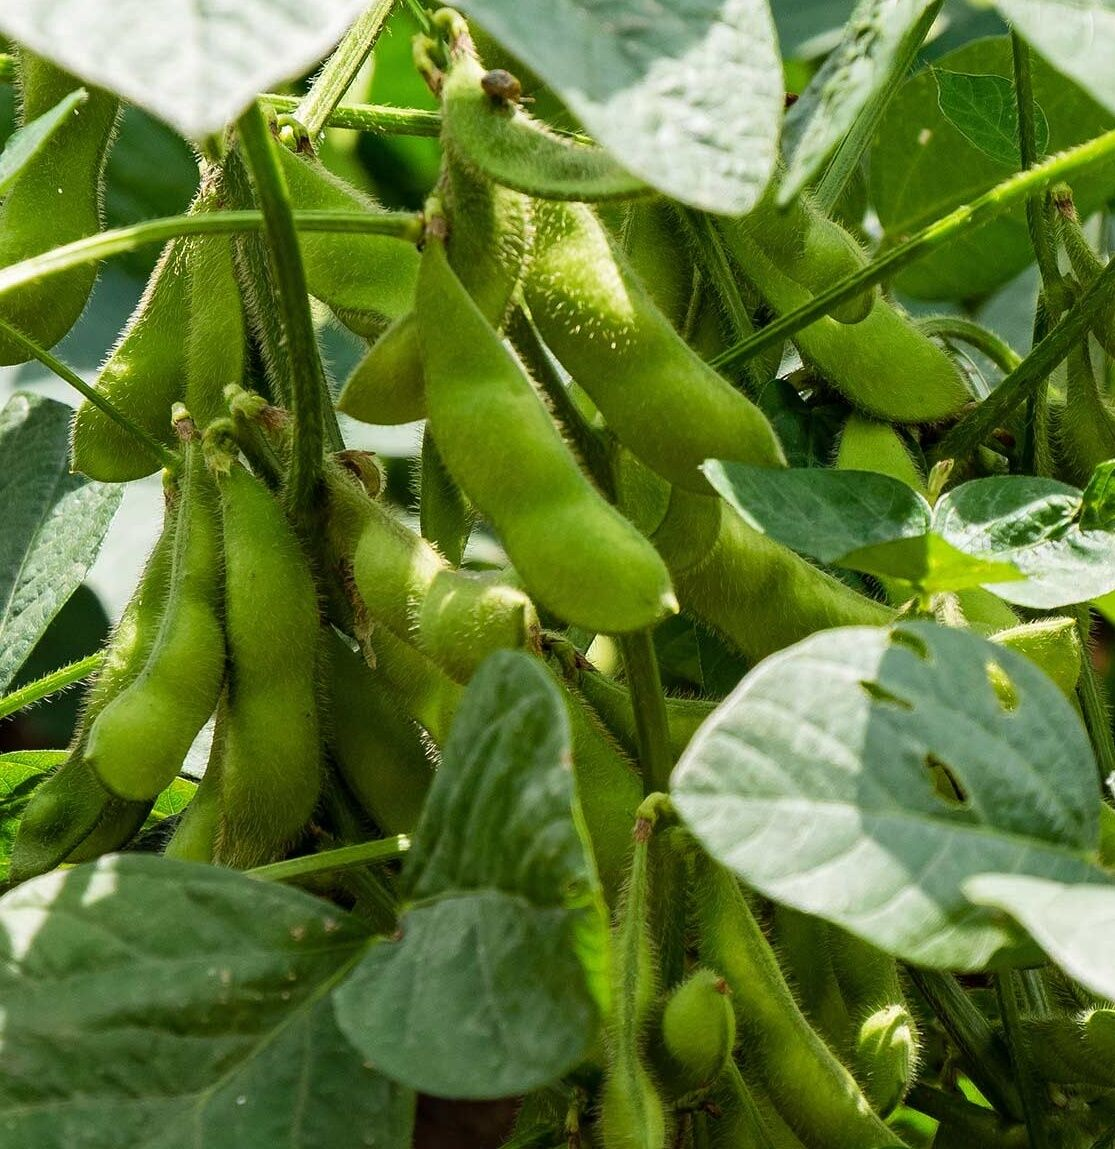 Sojabohne Samen, Edamame seeds, Sorte MERLIN, Ökosaatgut, früheste Sorte